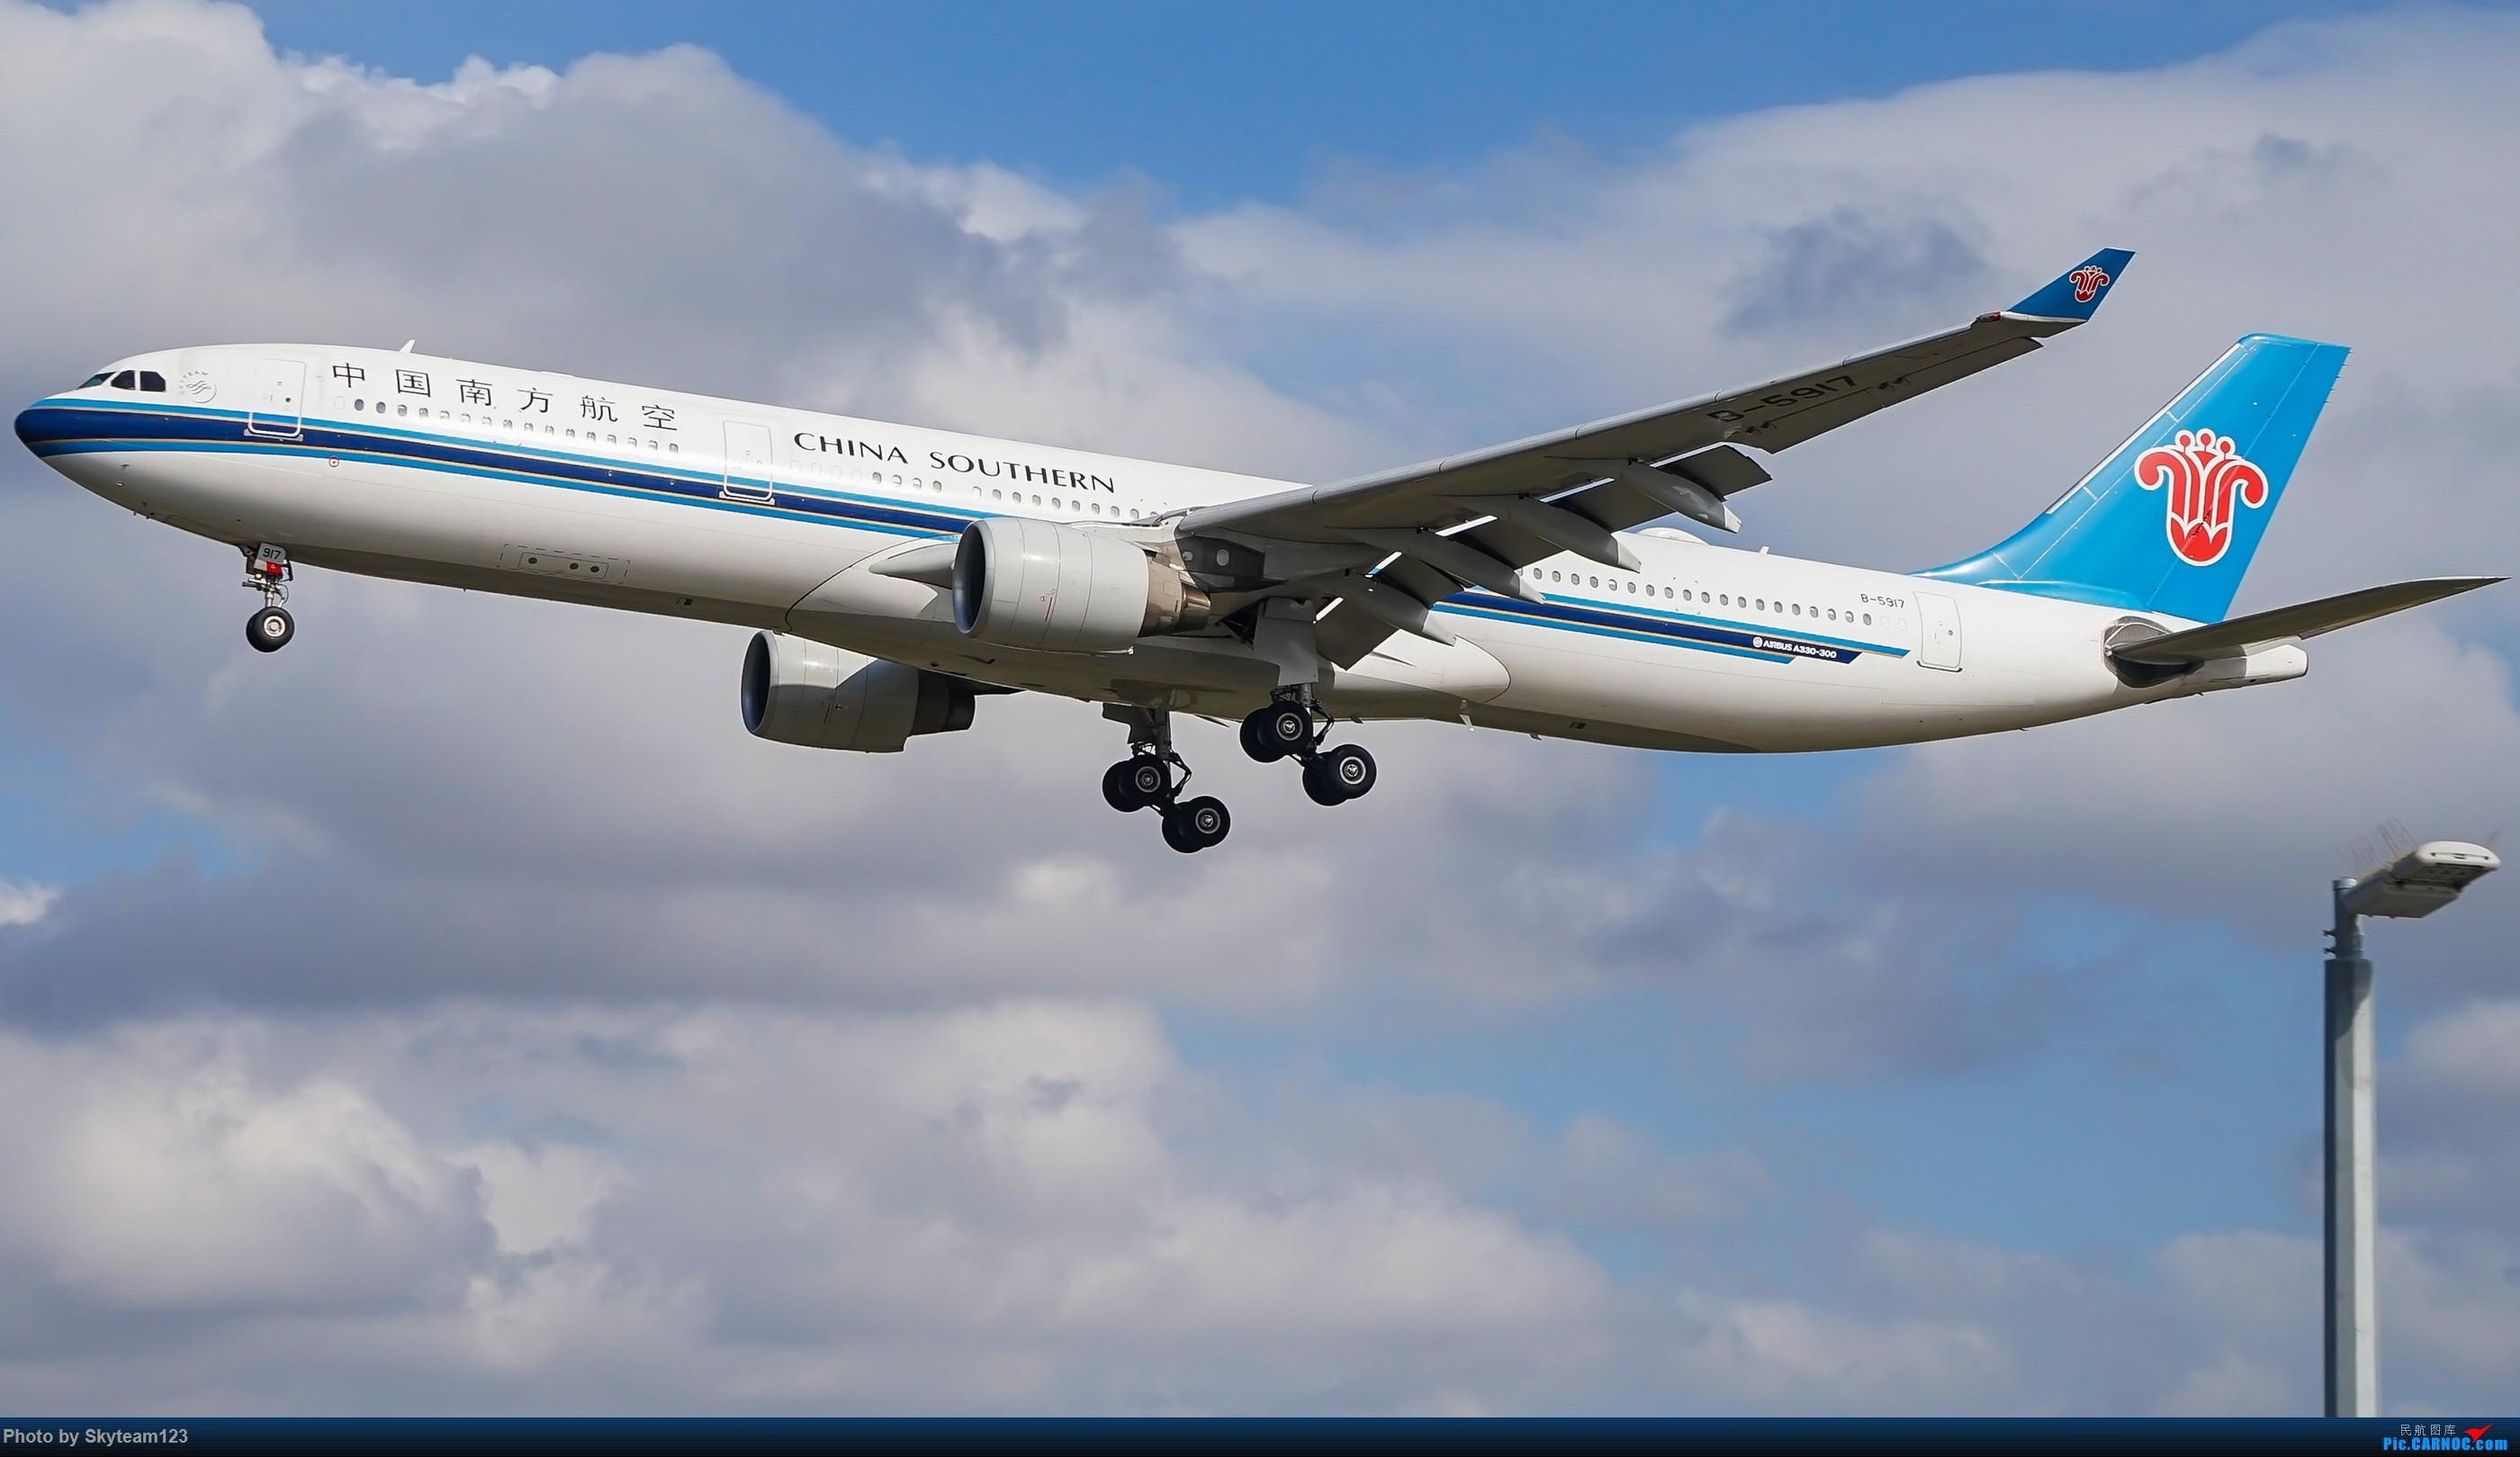 Re:[原创][SYD] 假期拍机小结 解锁16R跑道头拍机位 & 停车楼拍机作业 【全宽体】 AIRBUS A330-300 B-5917 澳大利亚悉尼金斯福德·史密斯机场